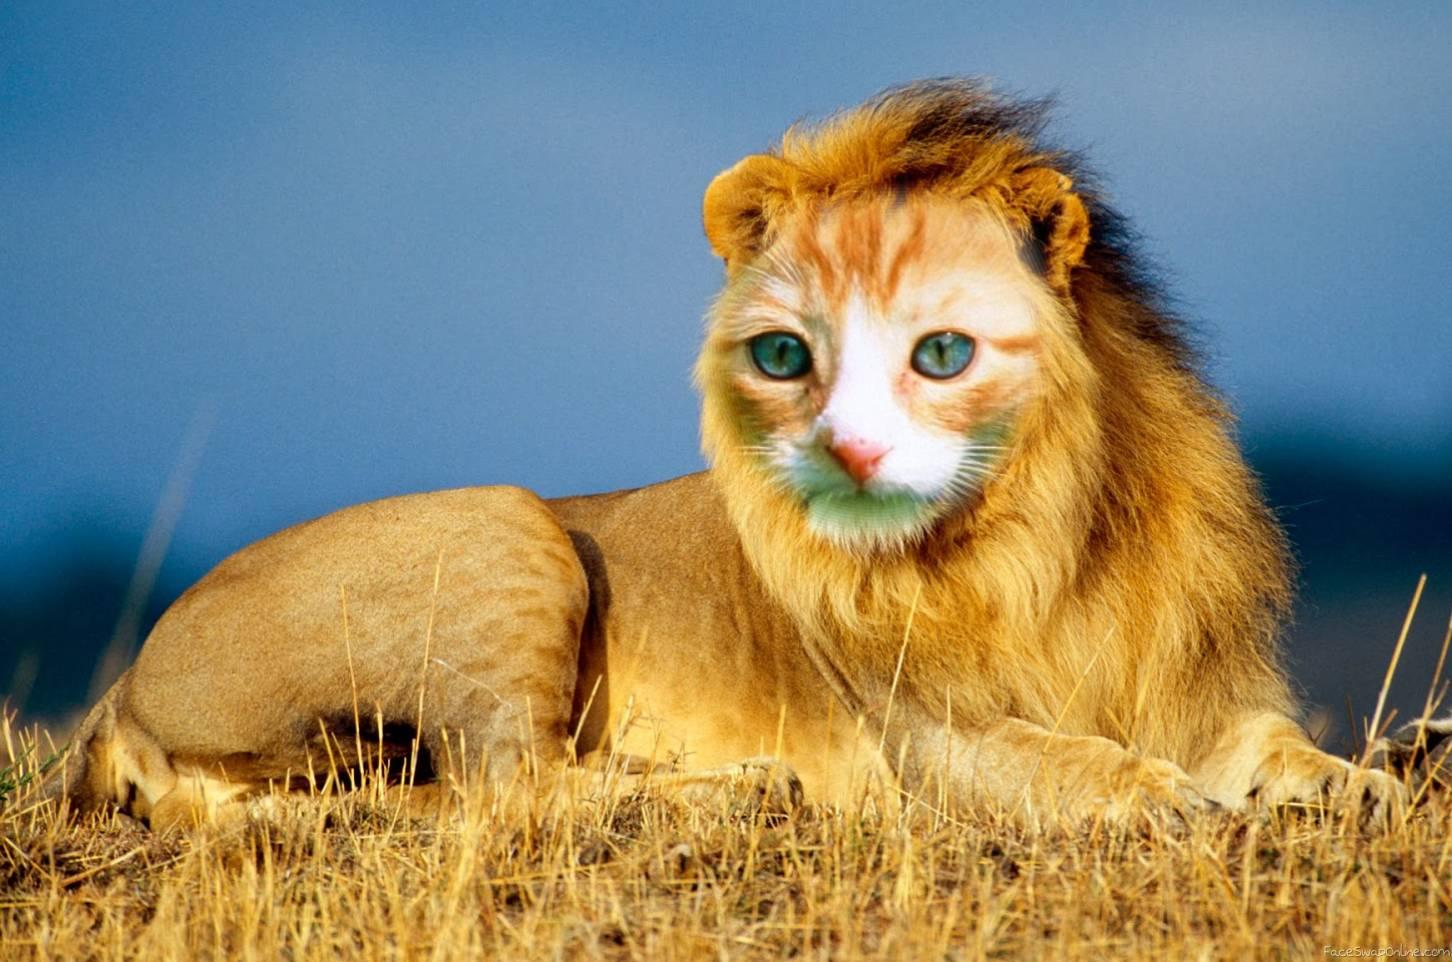 Lion King Kitty